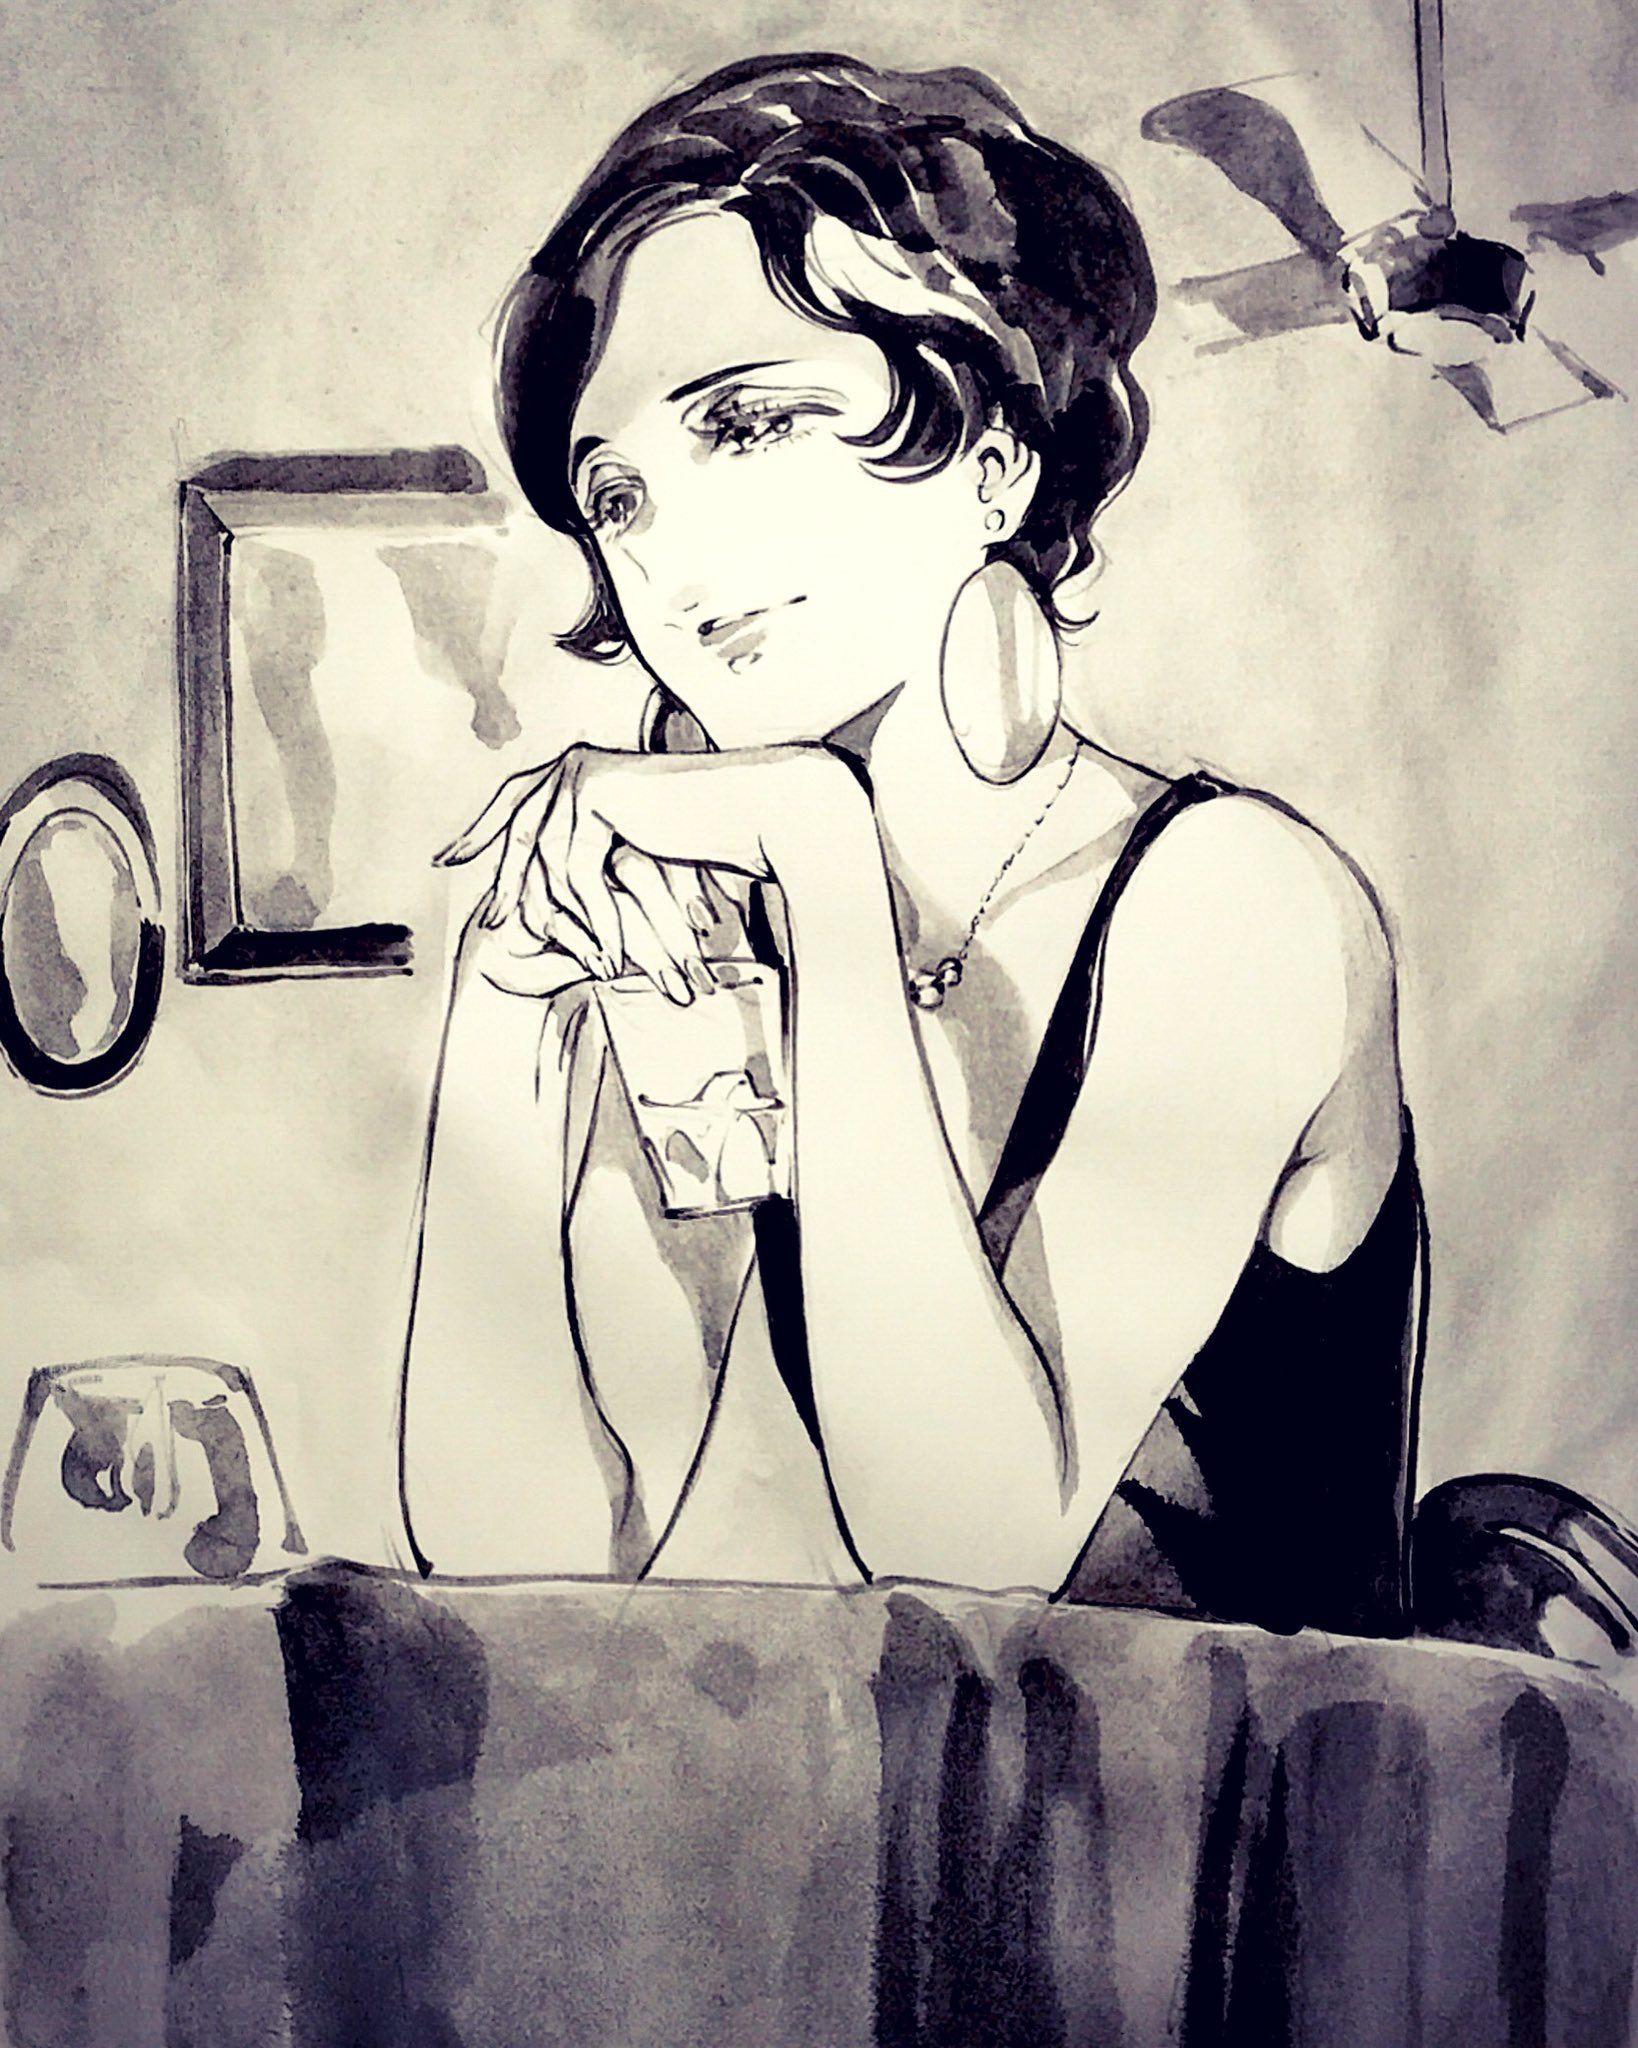 Ghibli おしゃれまとめの人気アイデア Pinterest Yuuki アントンシク アニメ 漫画 アニメ